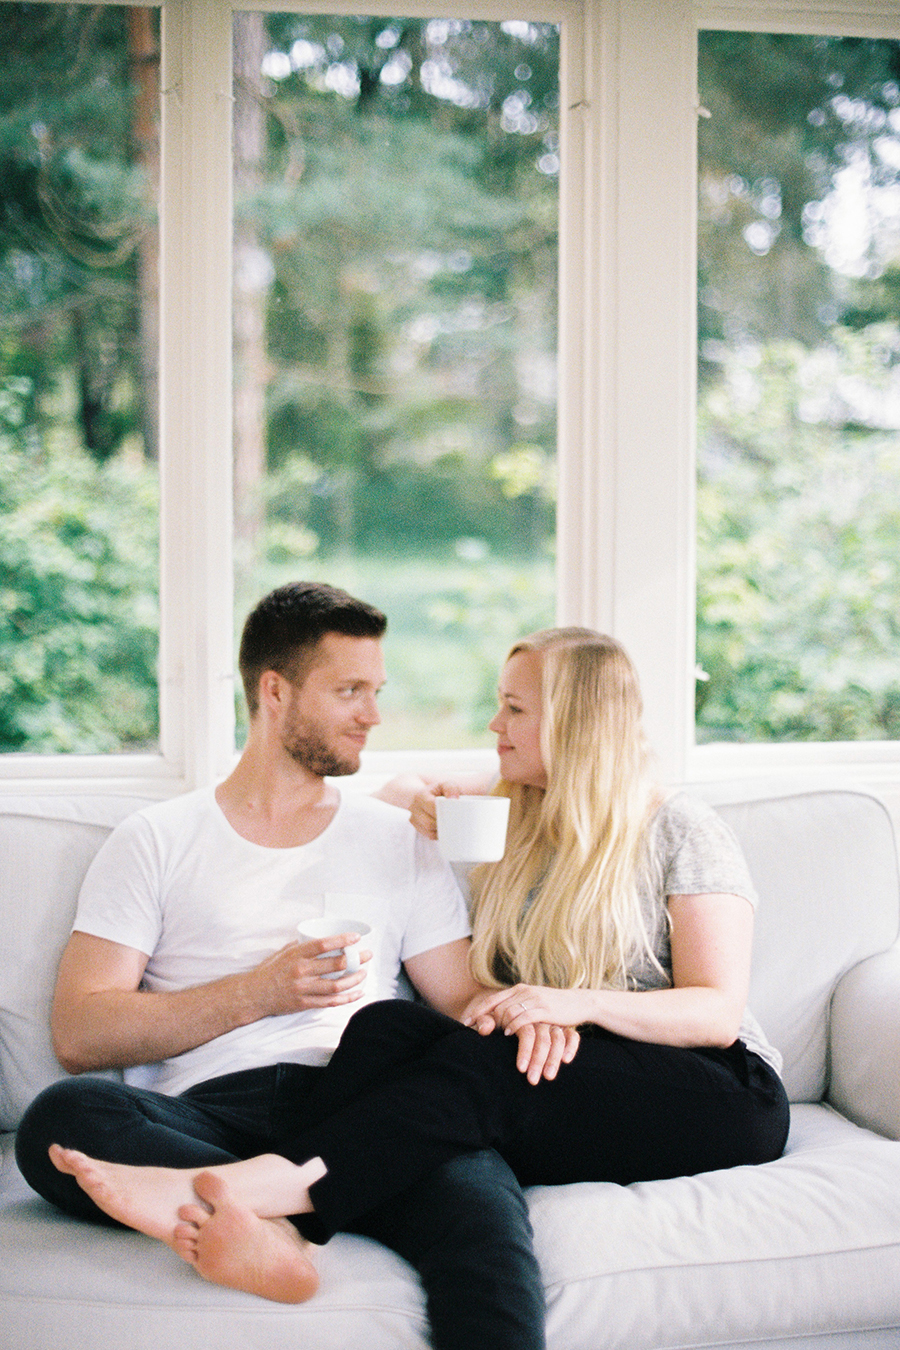 Morning at home couple session parikuvaus kihlakuvaus (1).jpg